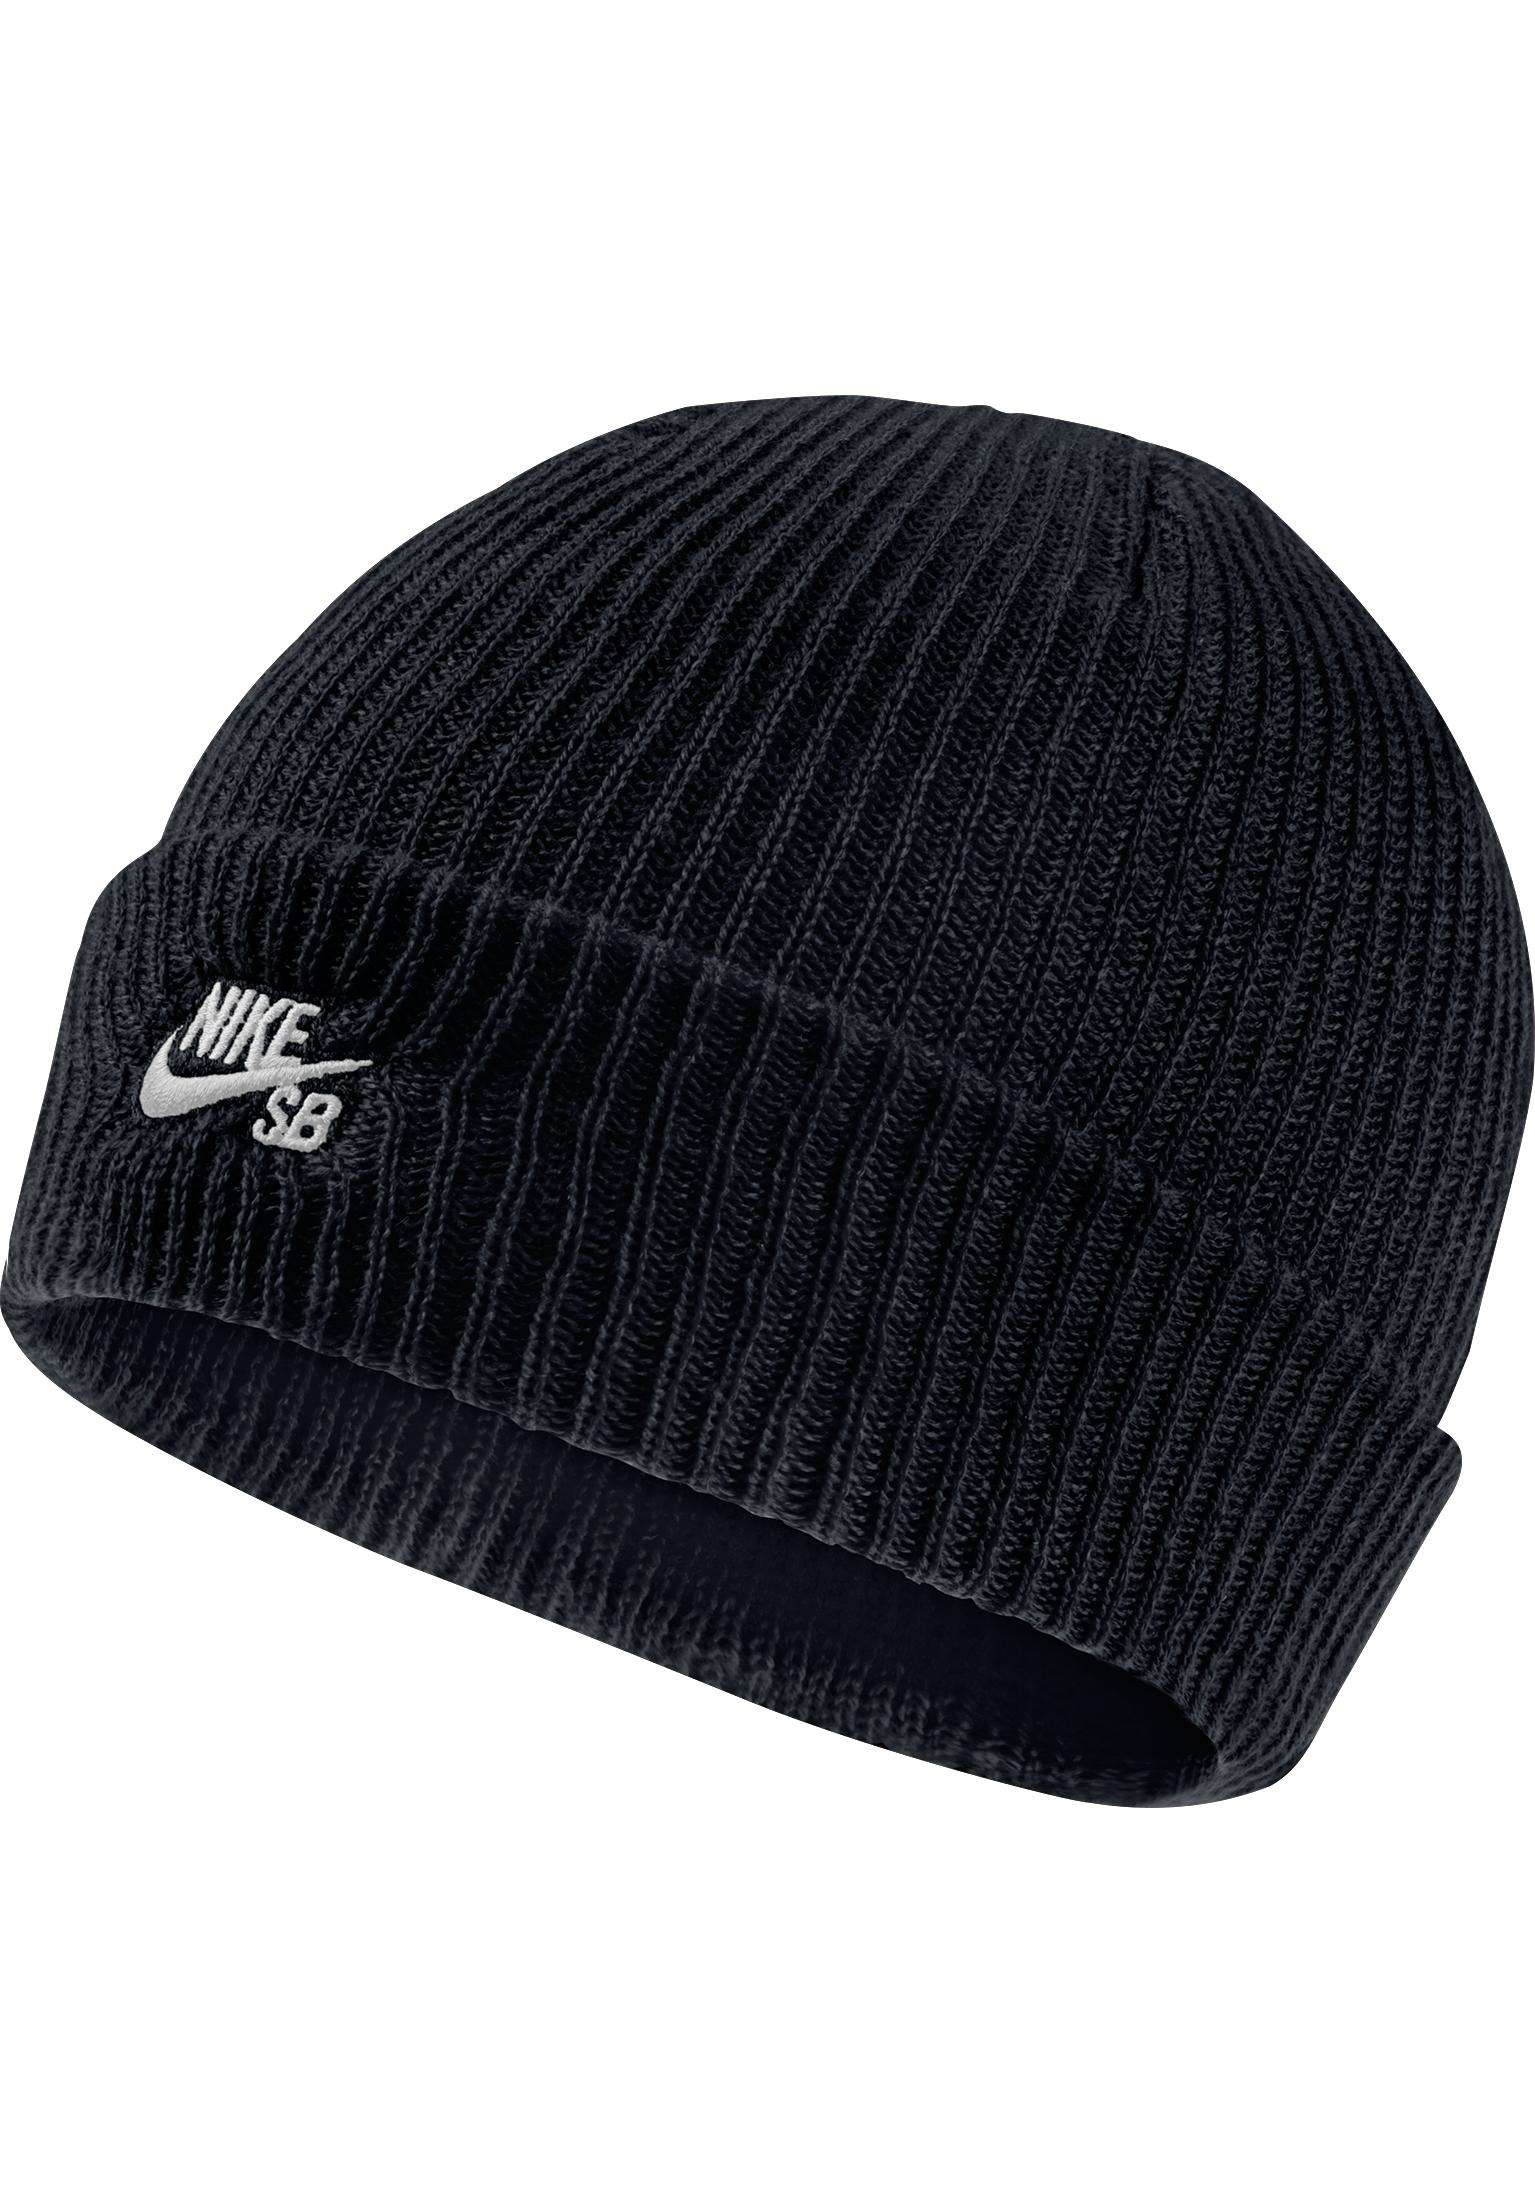 dc35fc4ae60 Fisherman Nike SB Beanies in black-white for Men